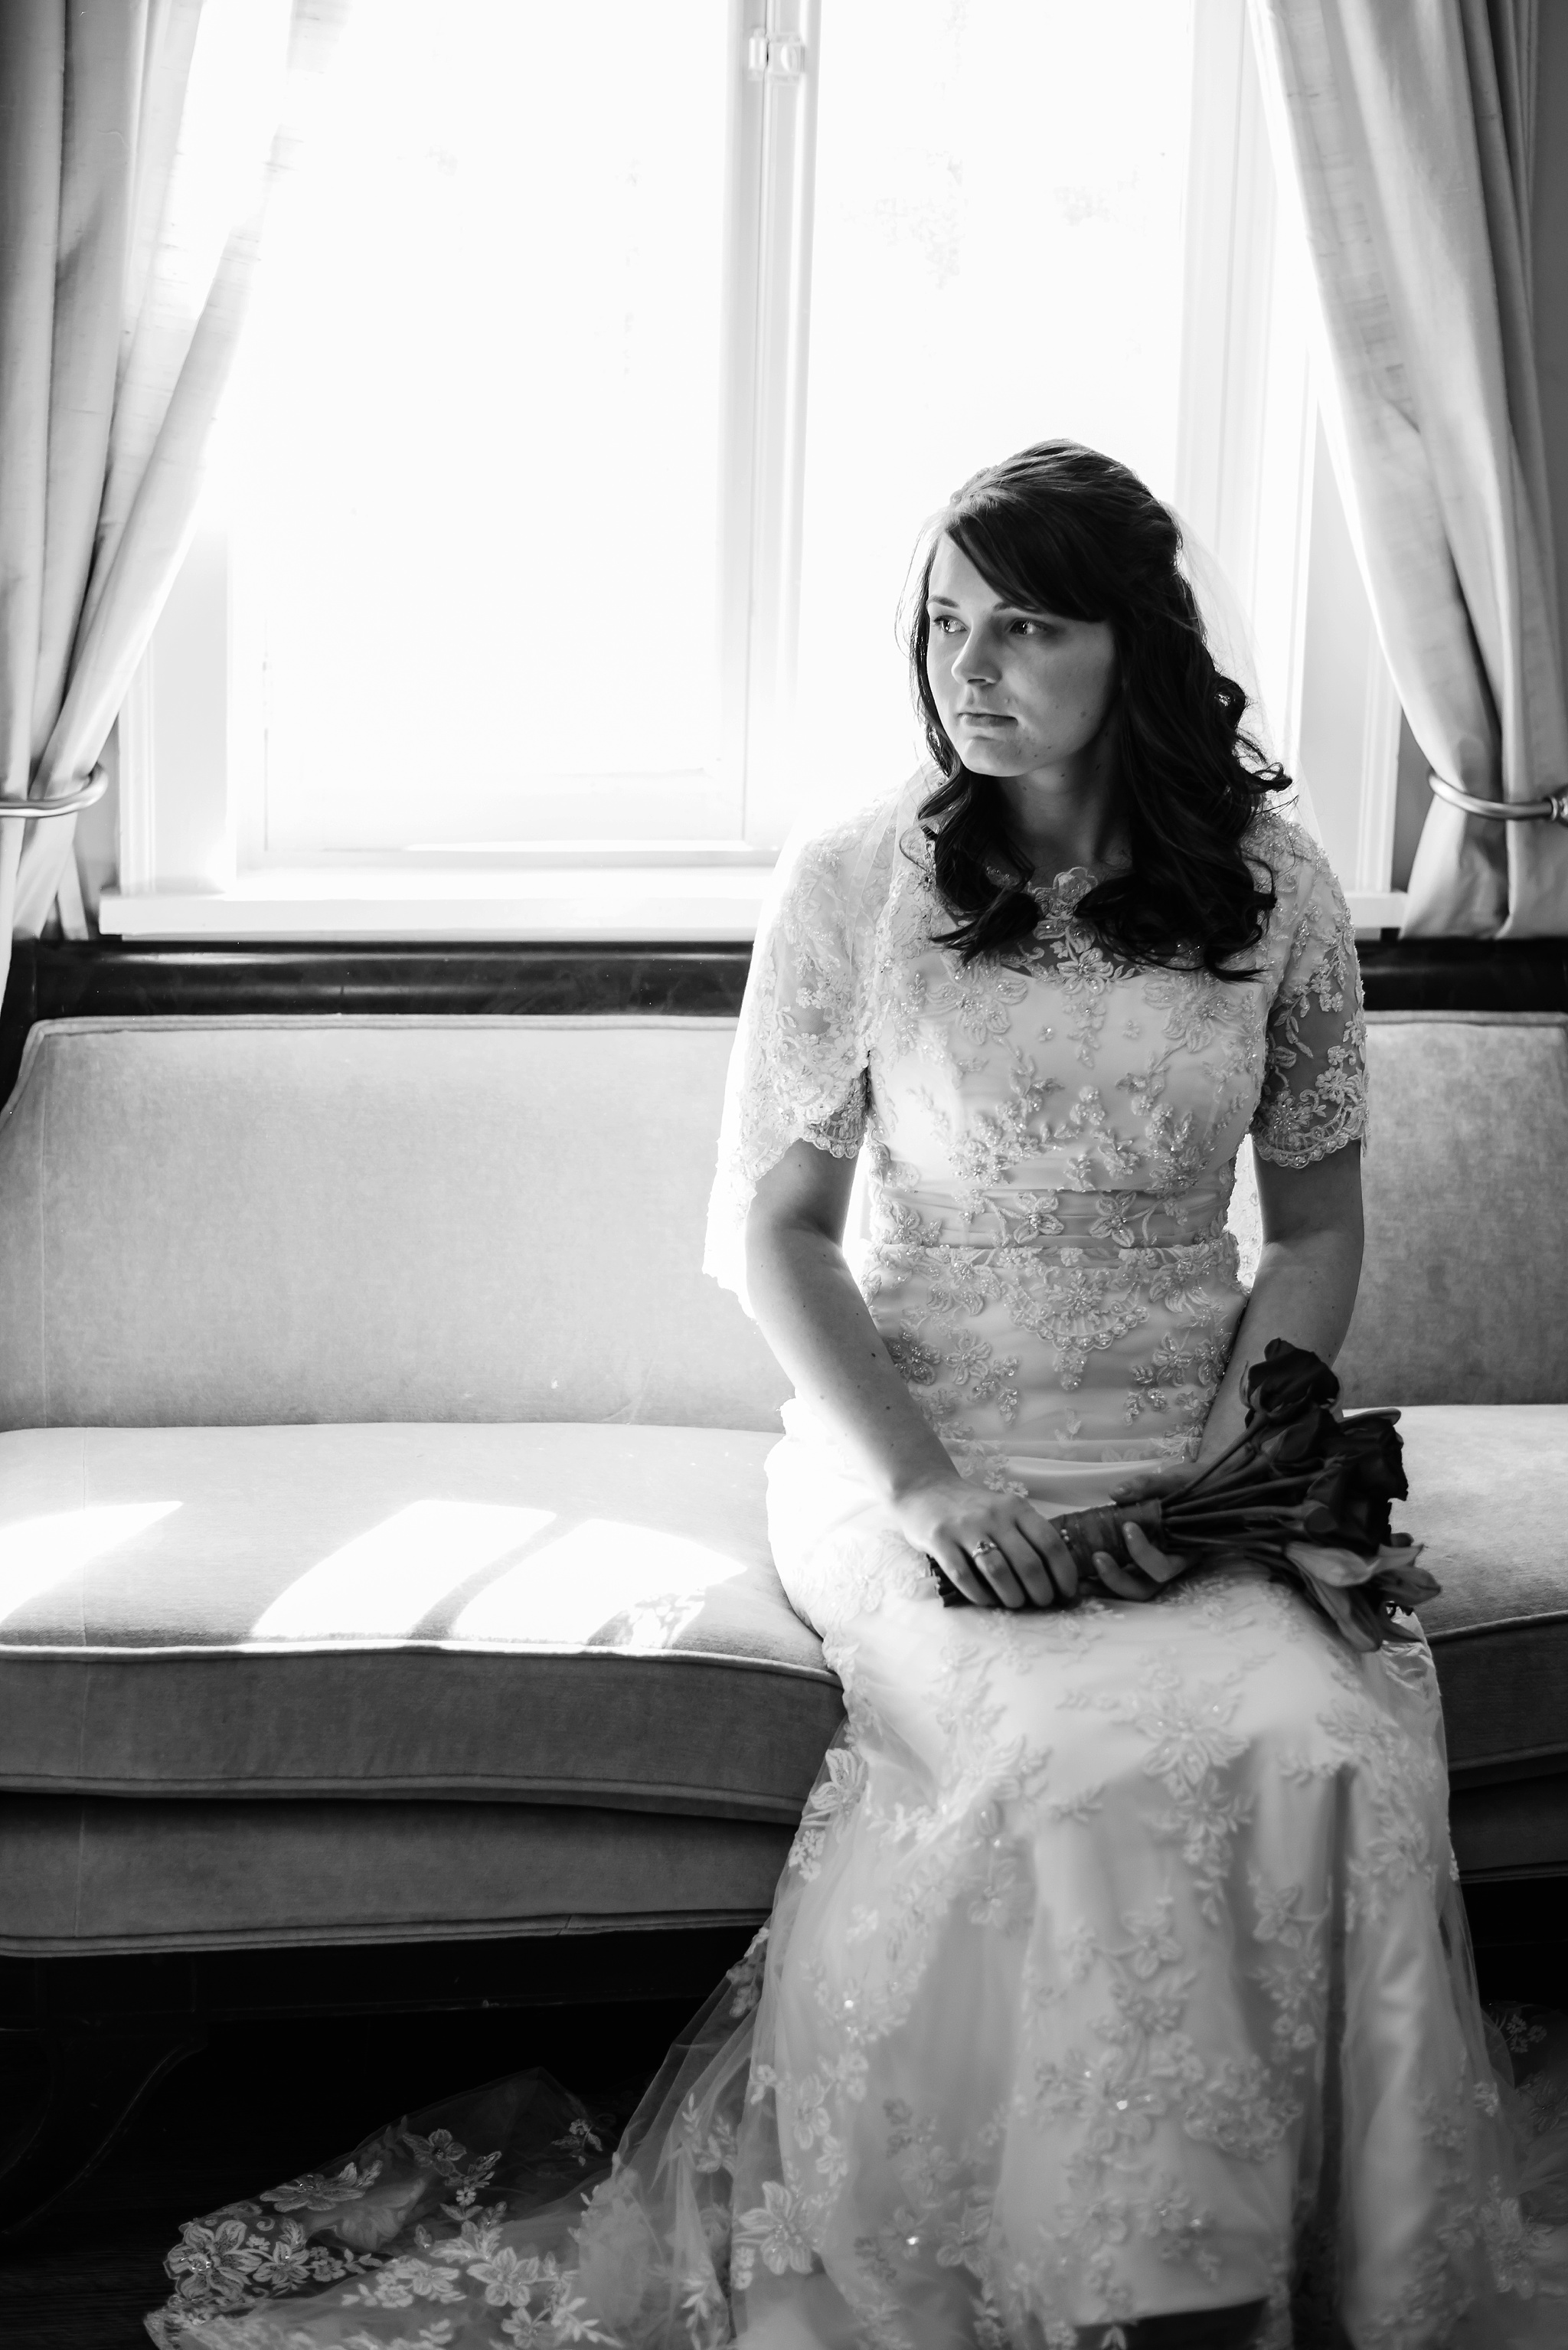 Park City Wedding Photographer Ali Sumsion 018